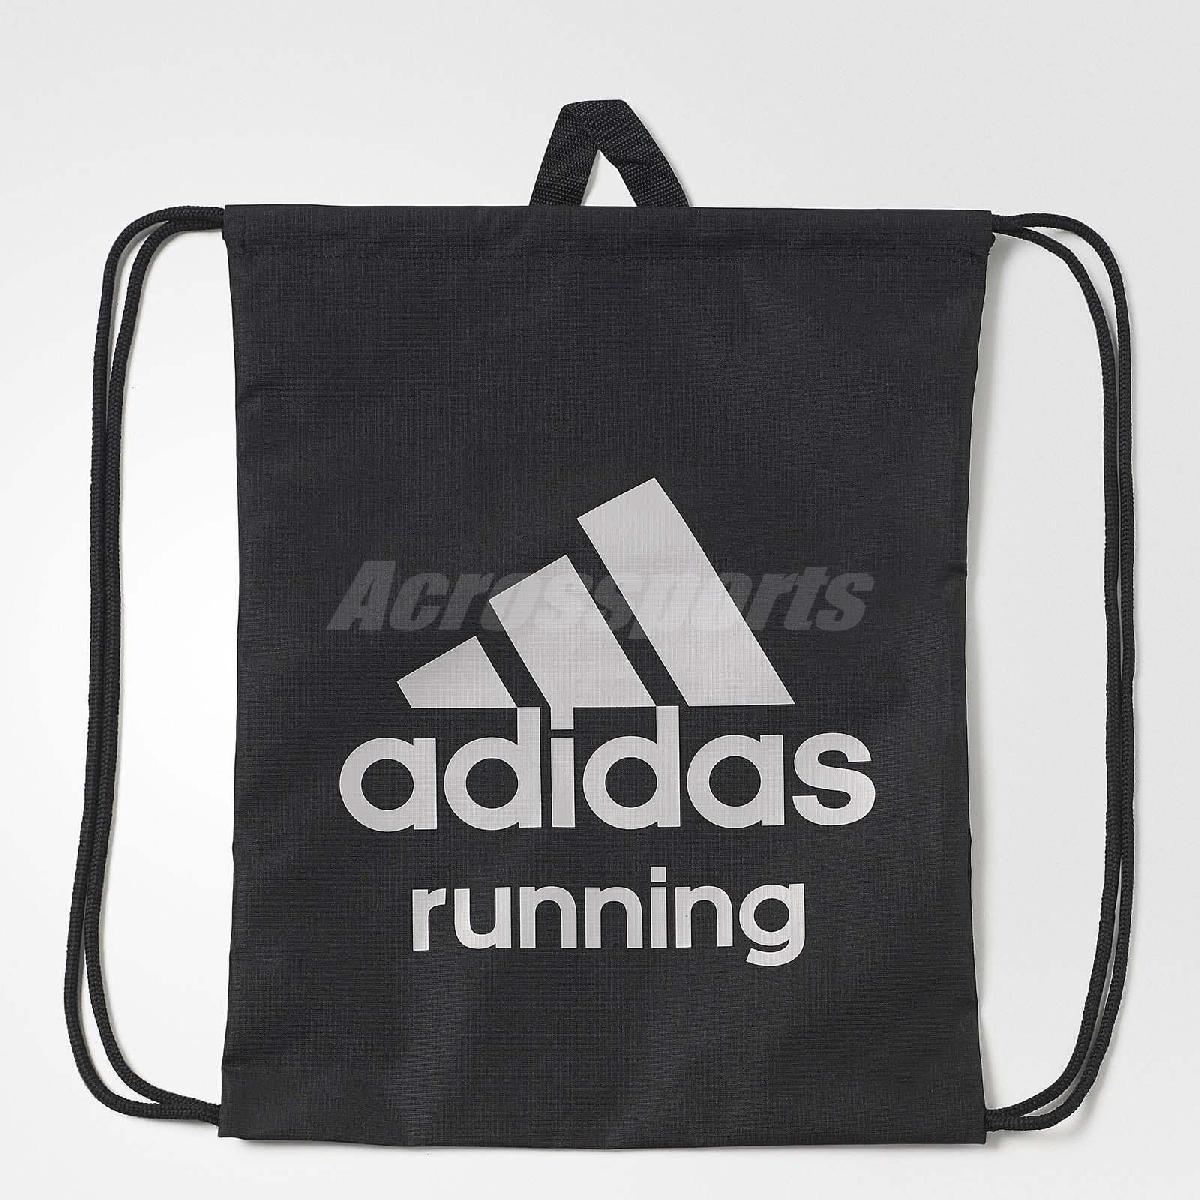 adidas 後背包 Run Gym Bag 黑 銀灰 束口袋 運動包 男女款 慢跑款 【PUMP306】 AC1794